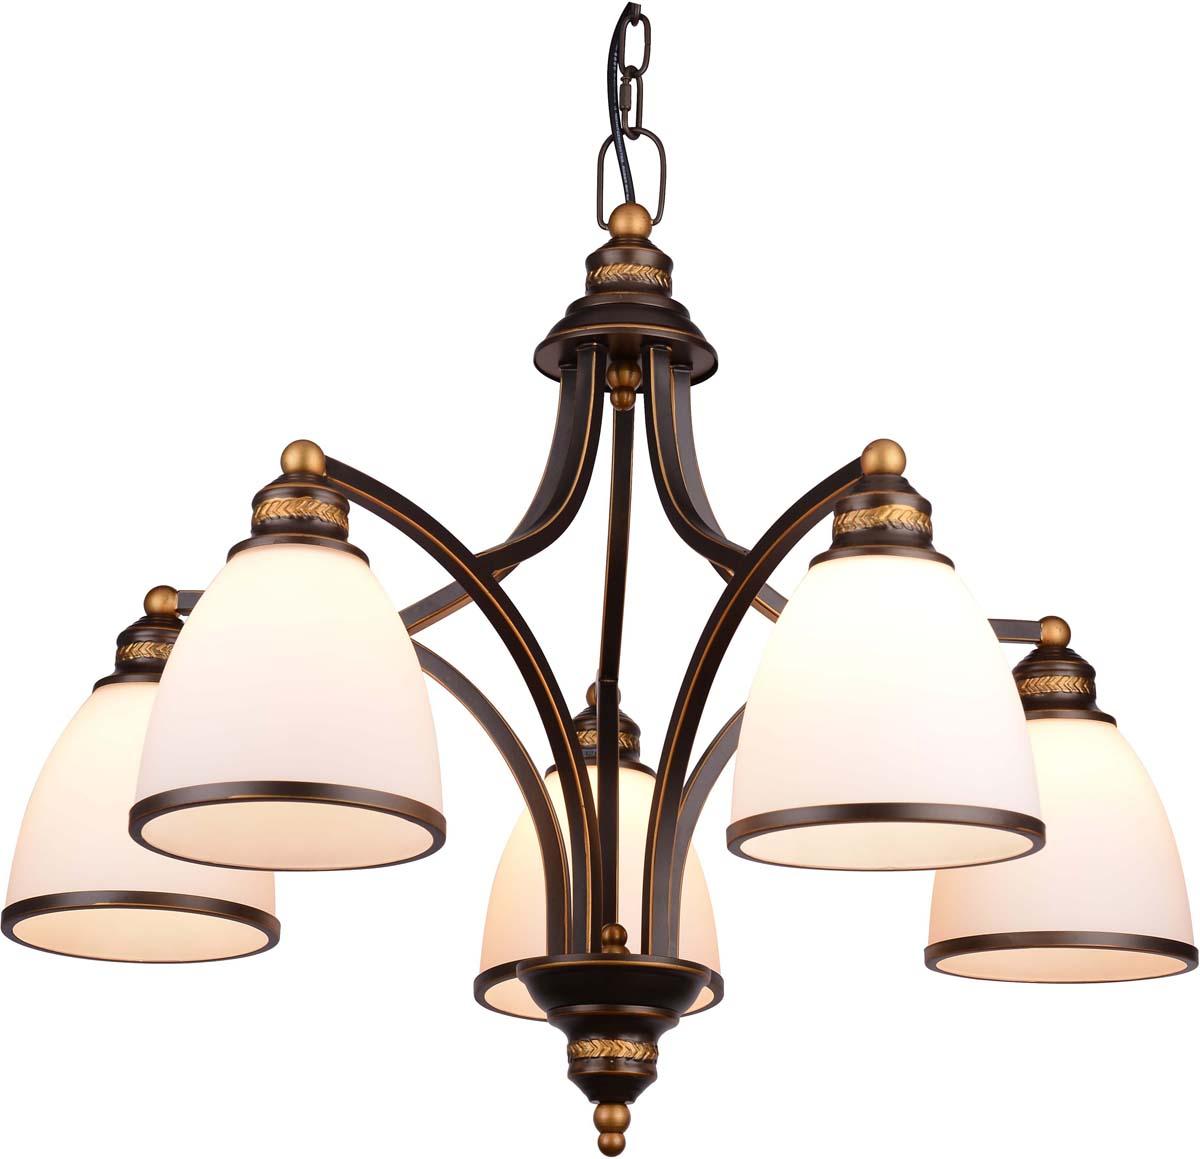 Светильник подвесной Arte Lamp Bonito, 5 х E27, 40 W. A9518LM-5BA arte lamp подвесной светильник arte lamp bonito a9518sp 3ba